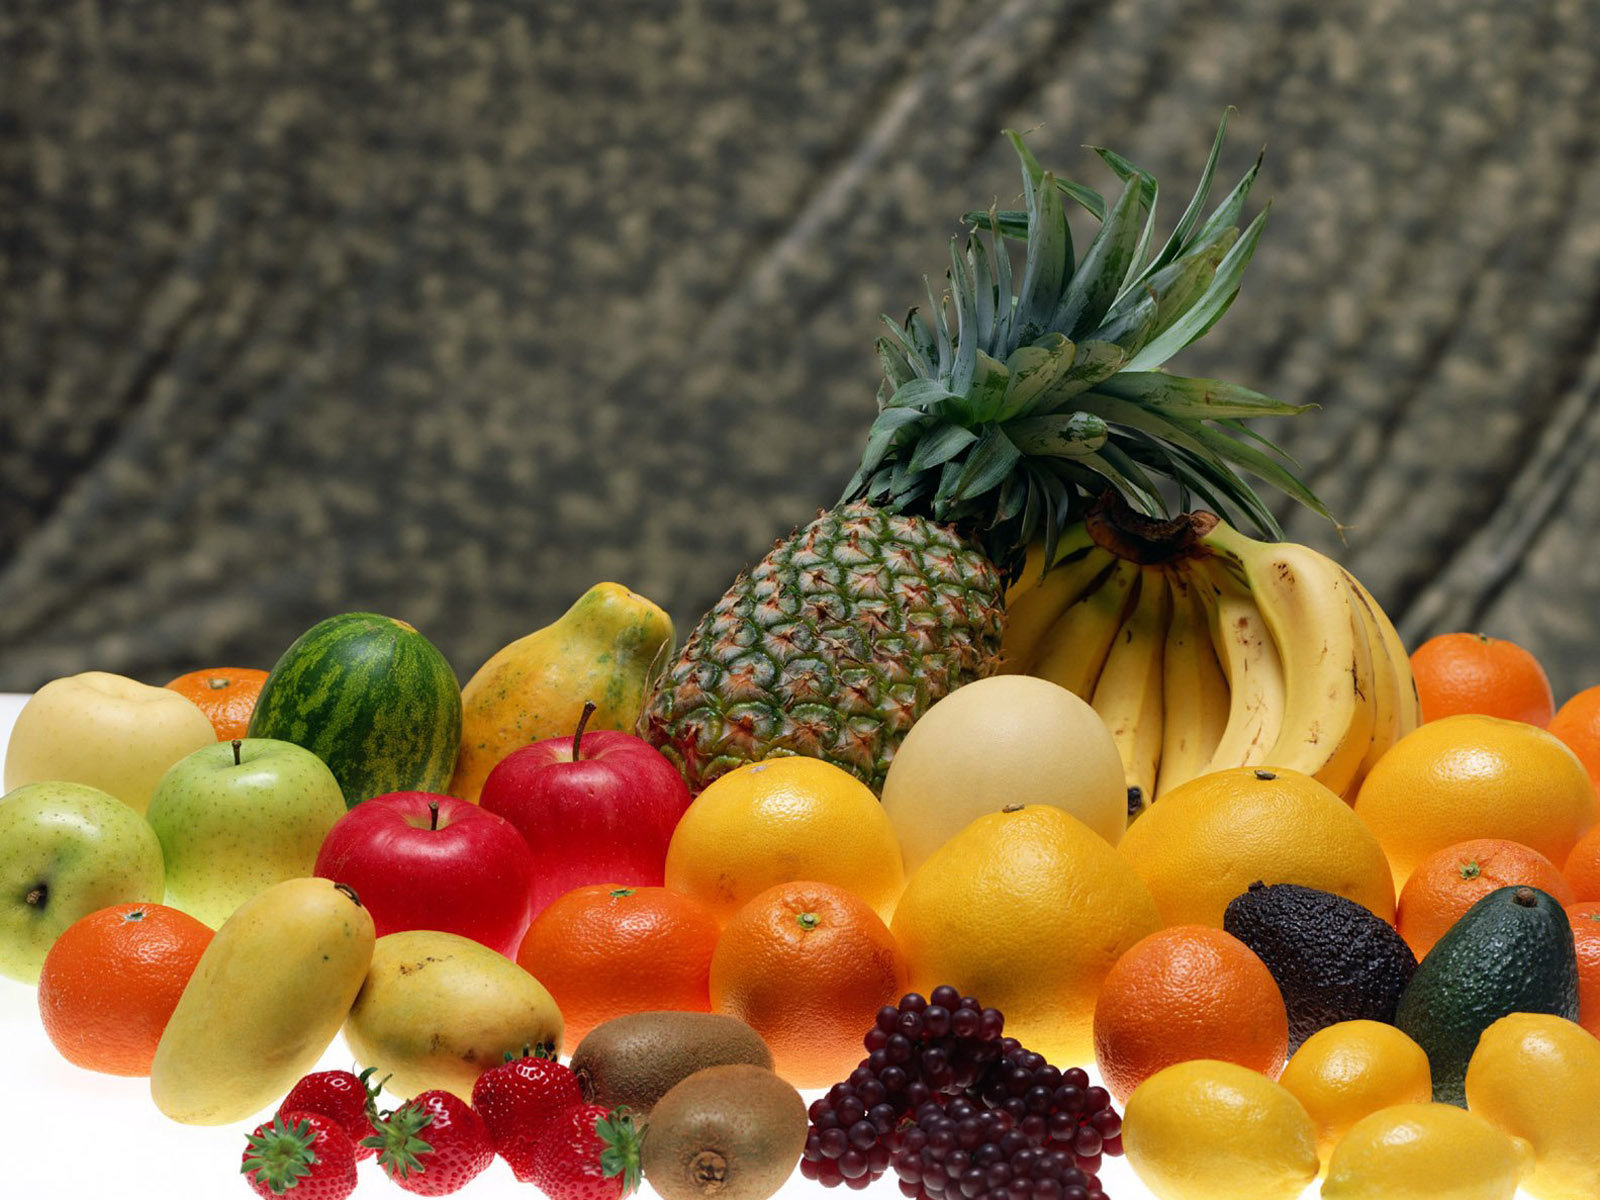 frukt-v-popu-foto